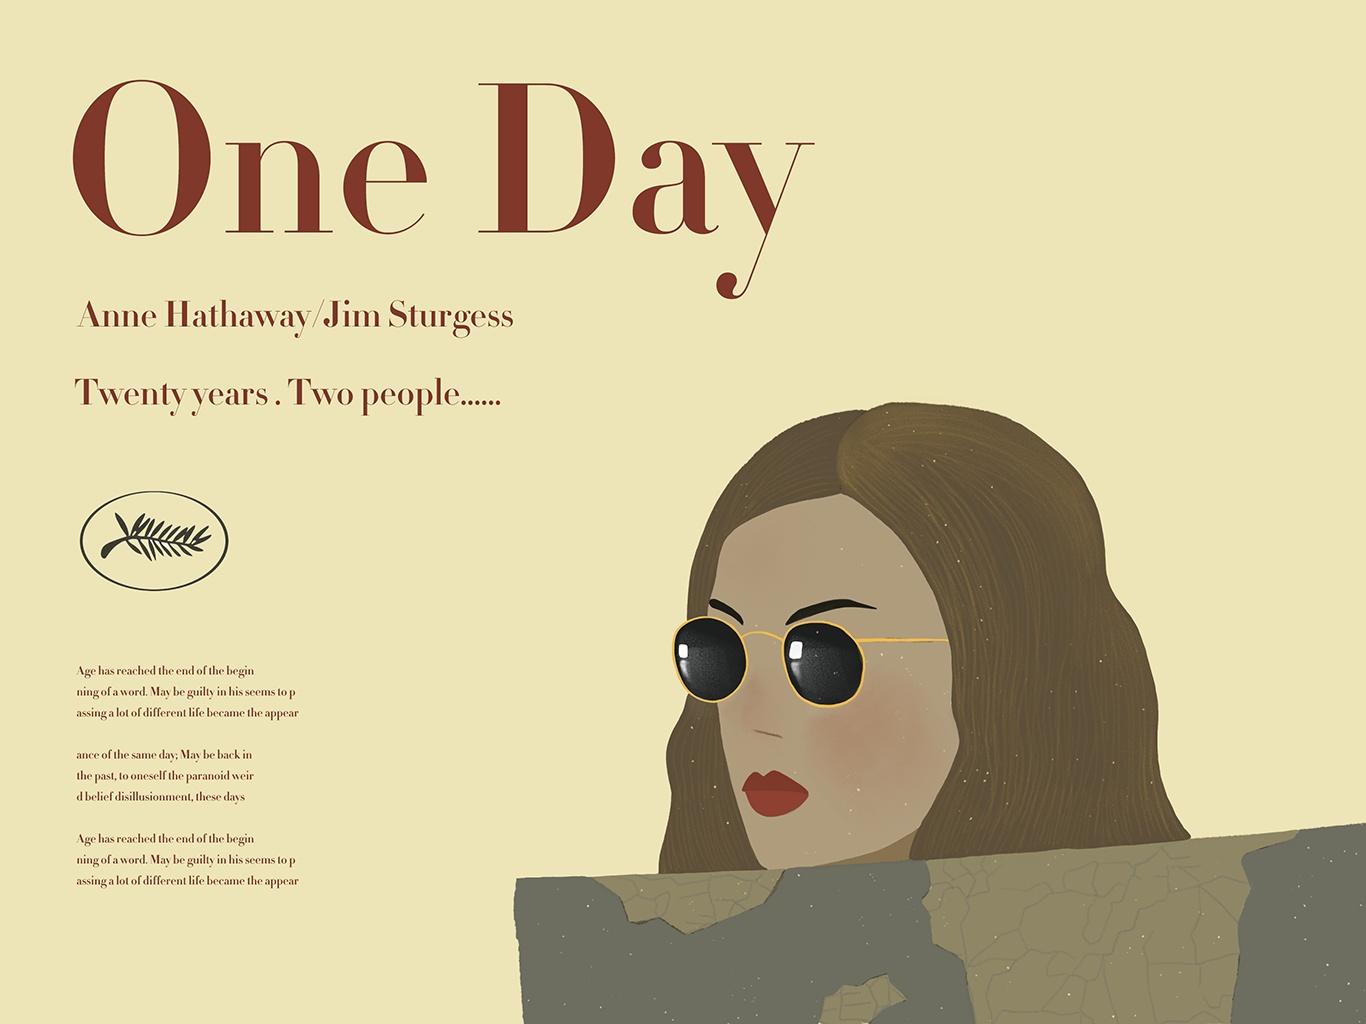 one day琴谱